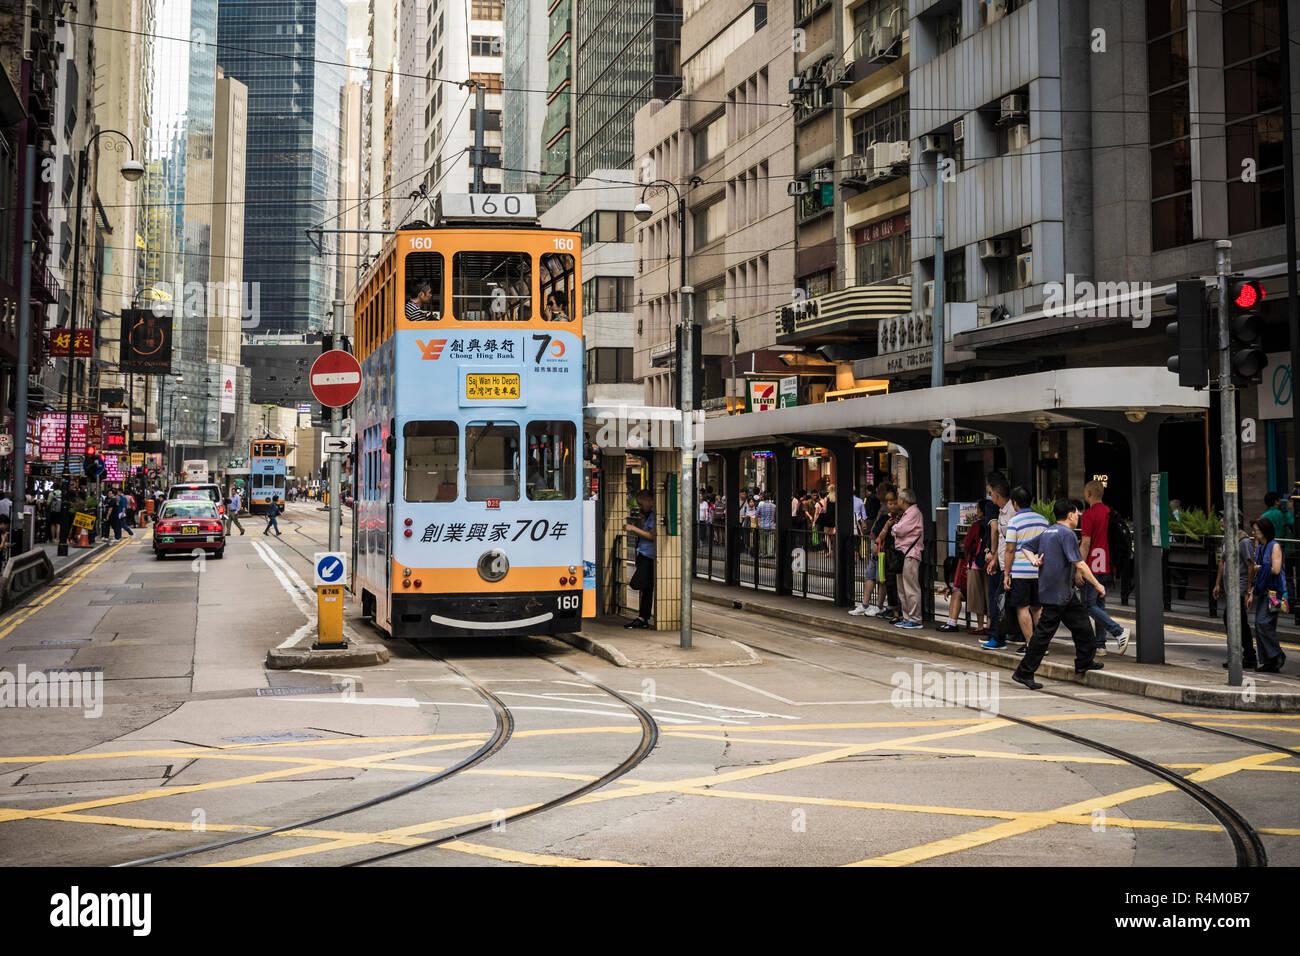 Street scene with trams in Sheung Wan, Hong Kong - Stock Image